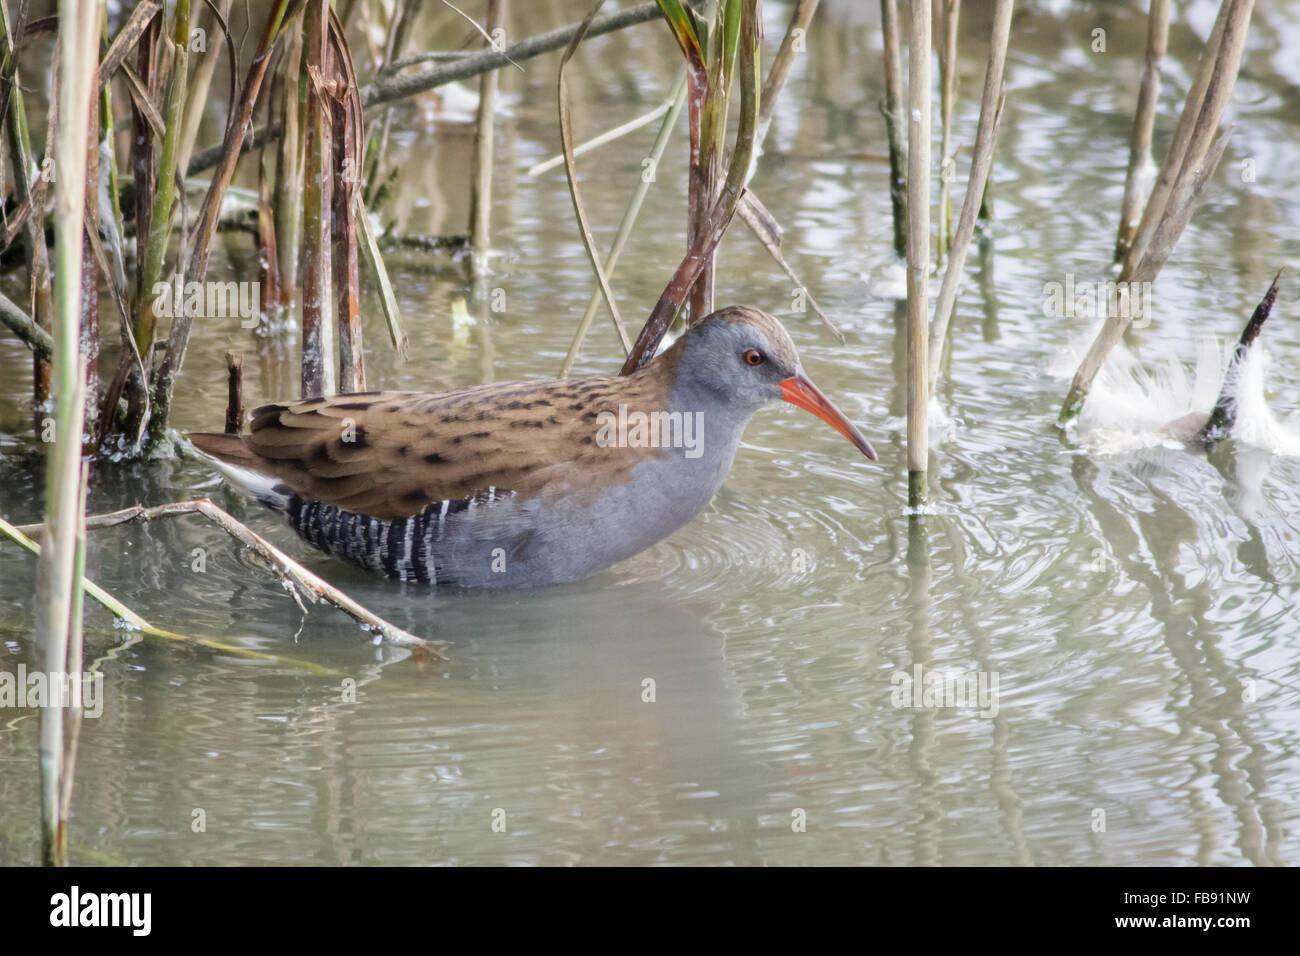 Water Rail (Rallus aquaticus) skulking among the reeds. - Stock Image